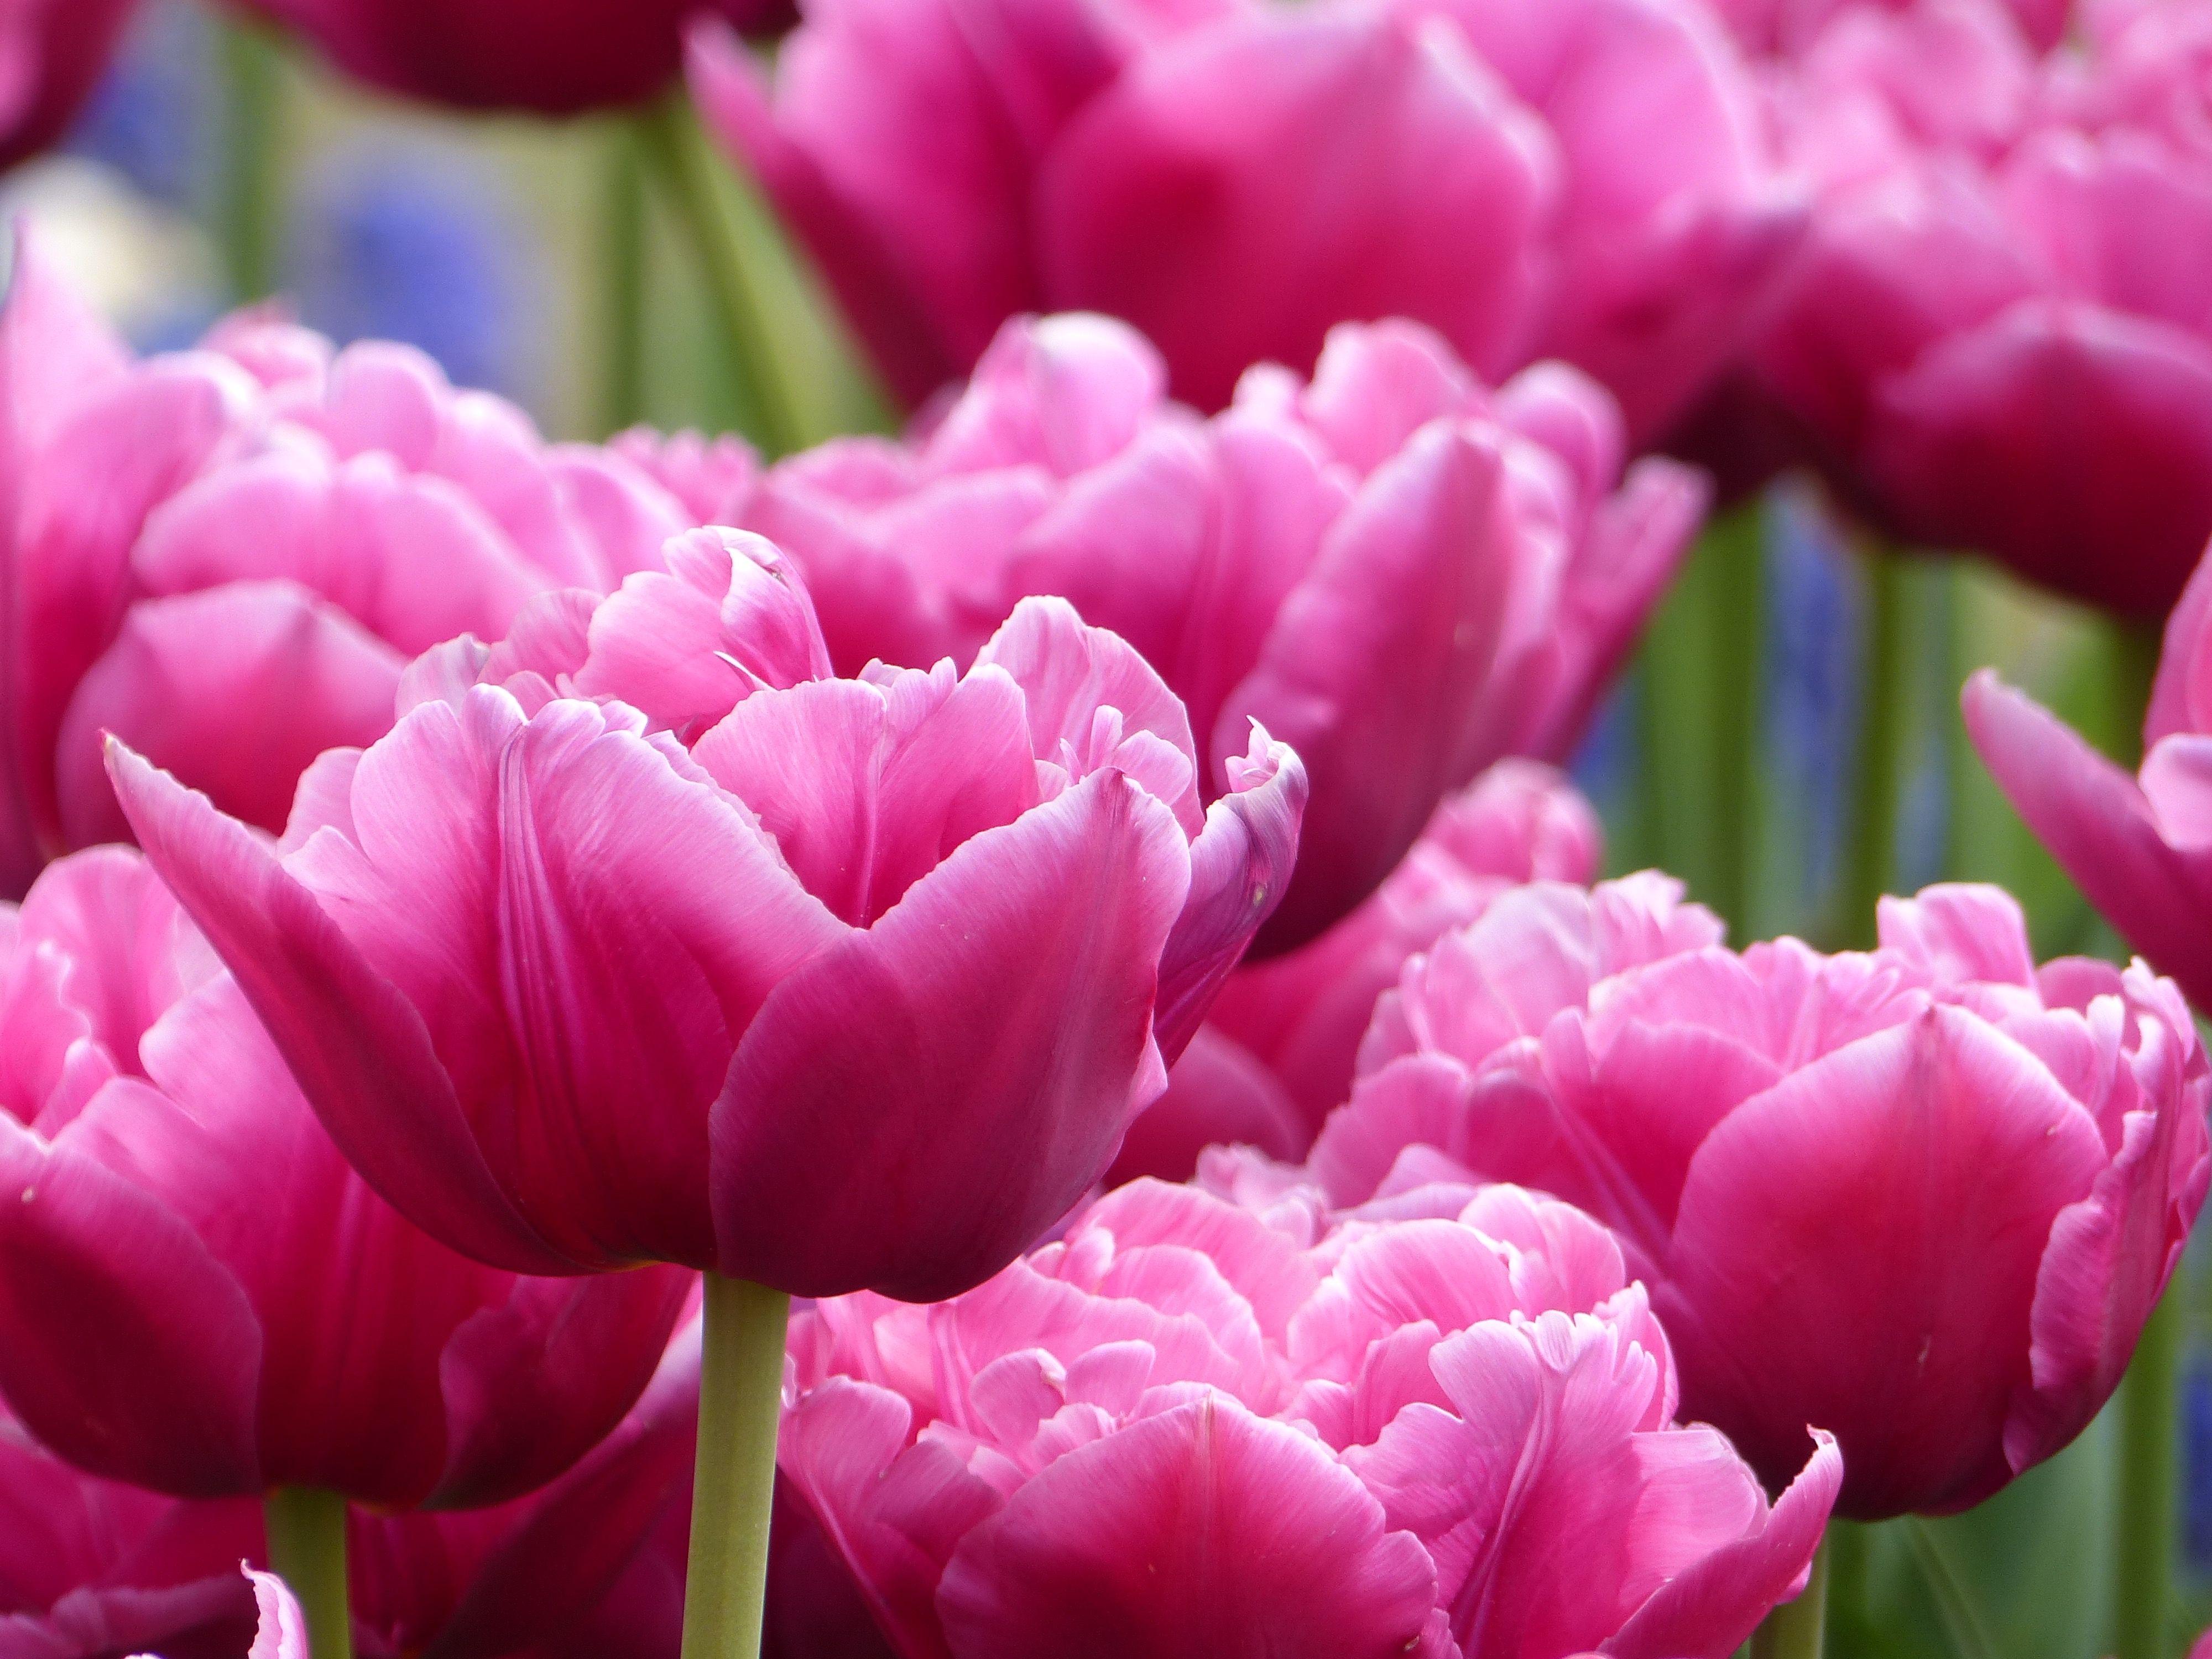 Tulpe Margarita Tulpen Tulpenzwiebeln Fruhlingsgarten